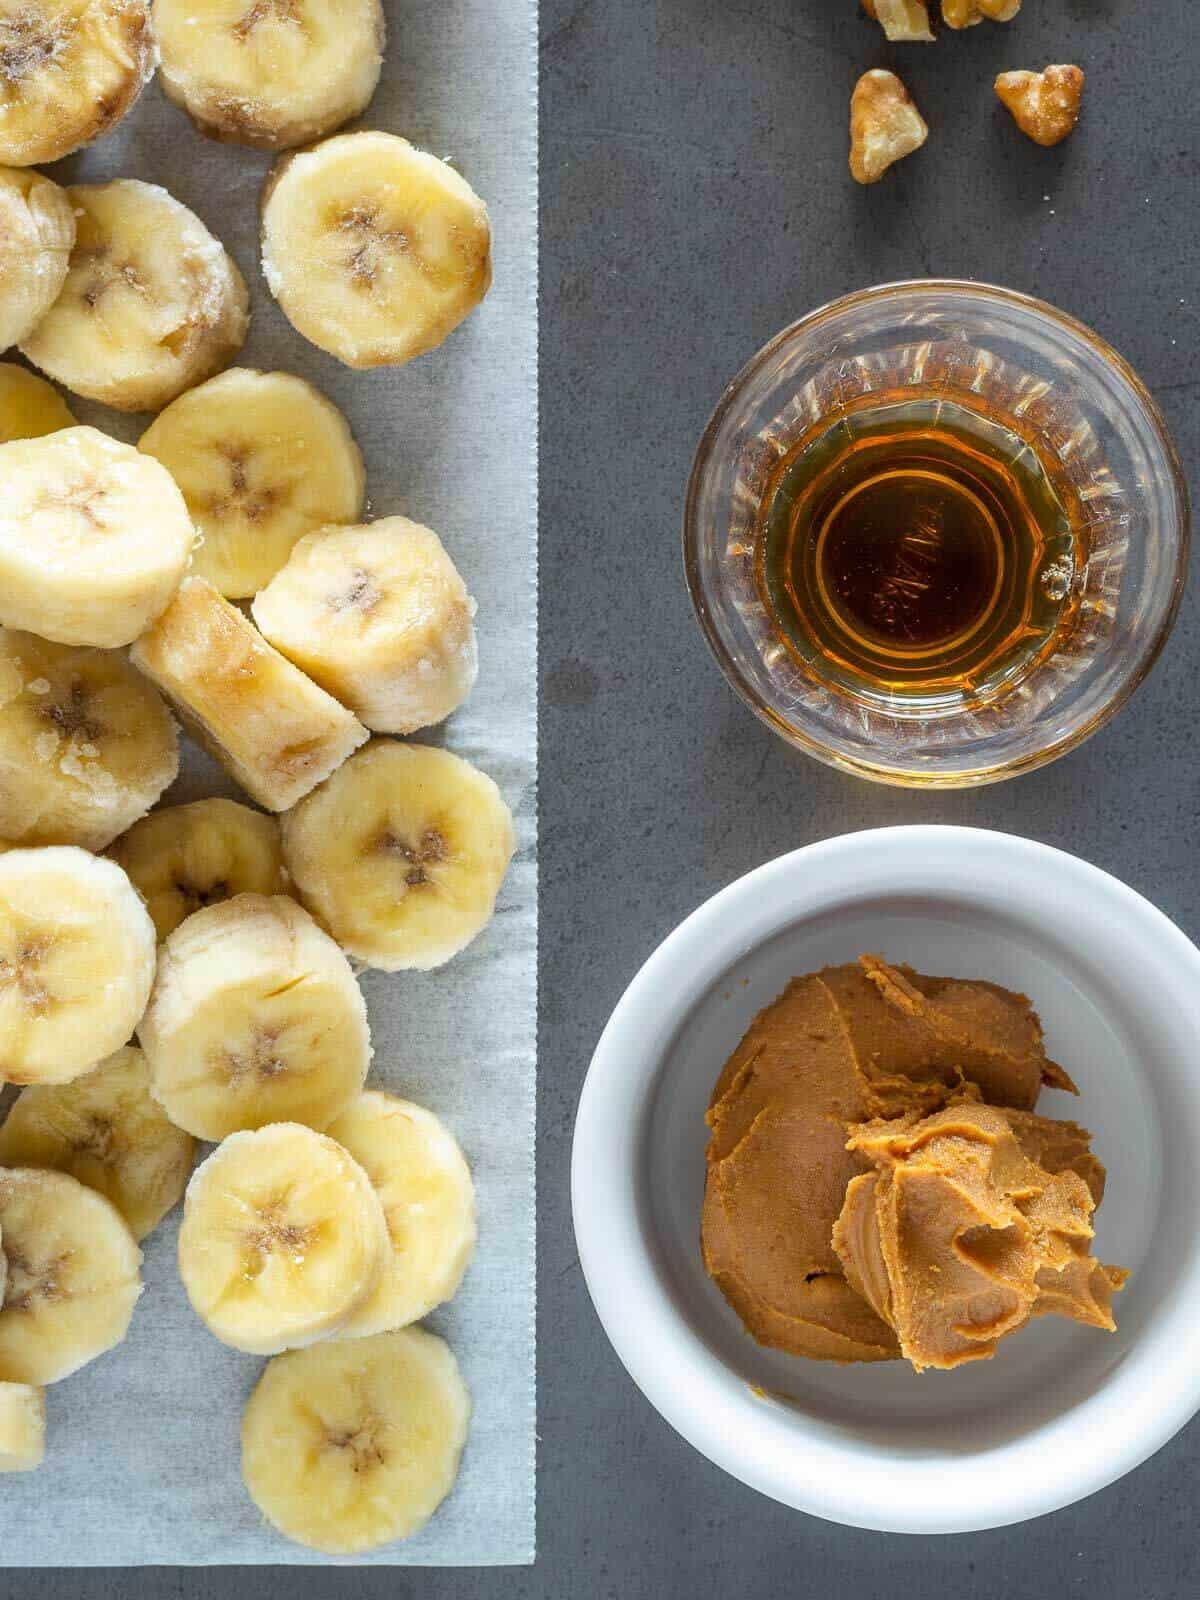 peanut banana ice cream ingredients